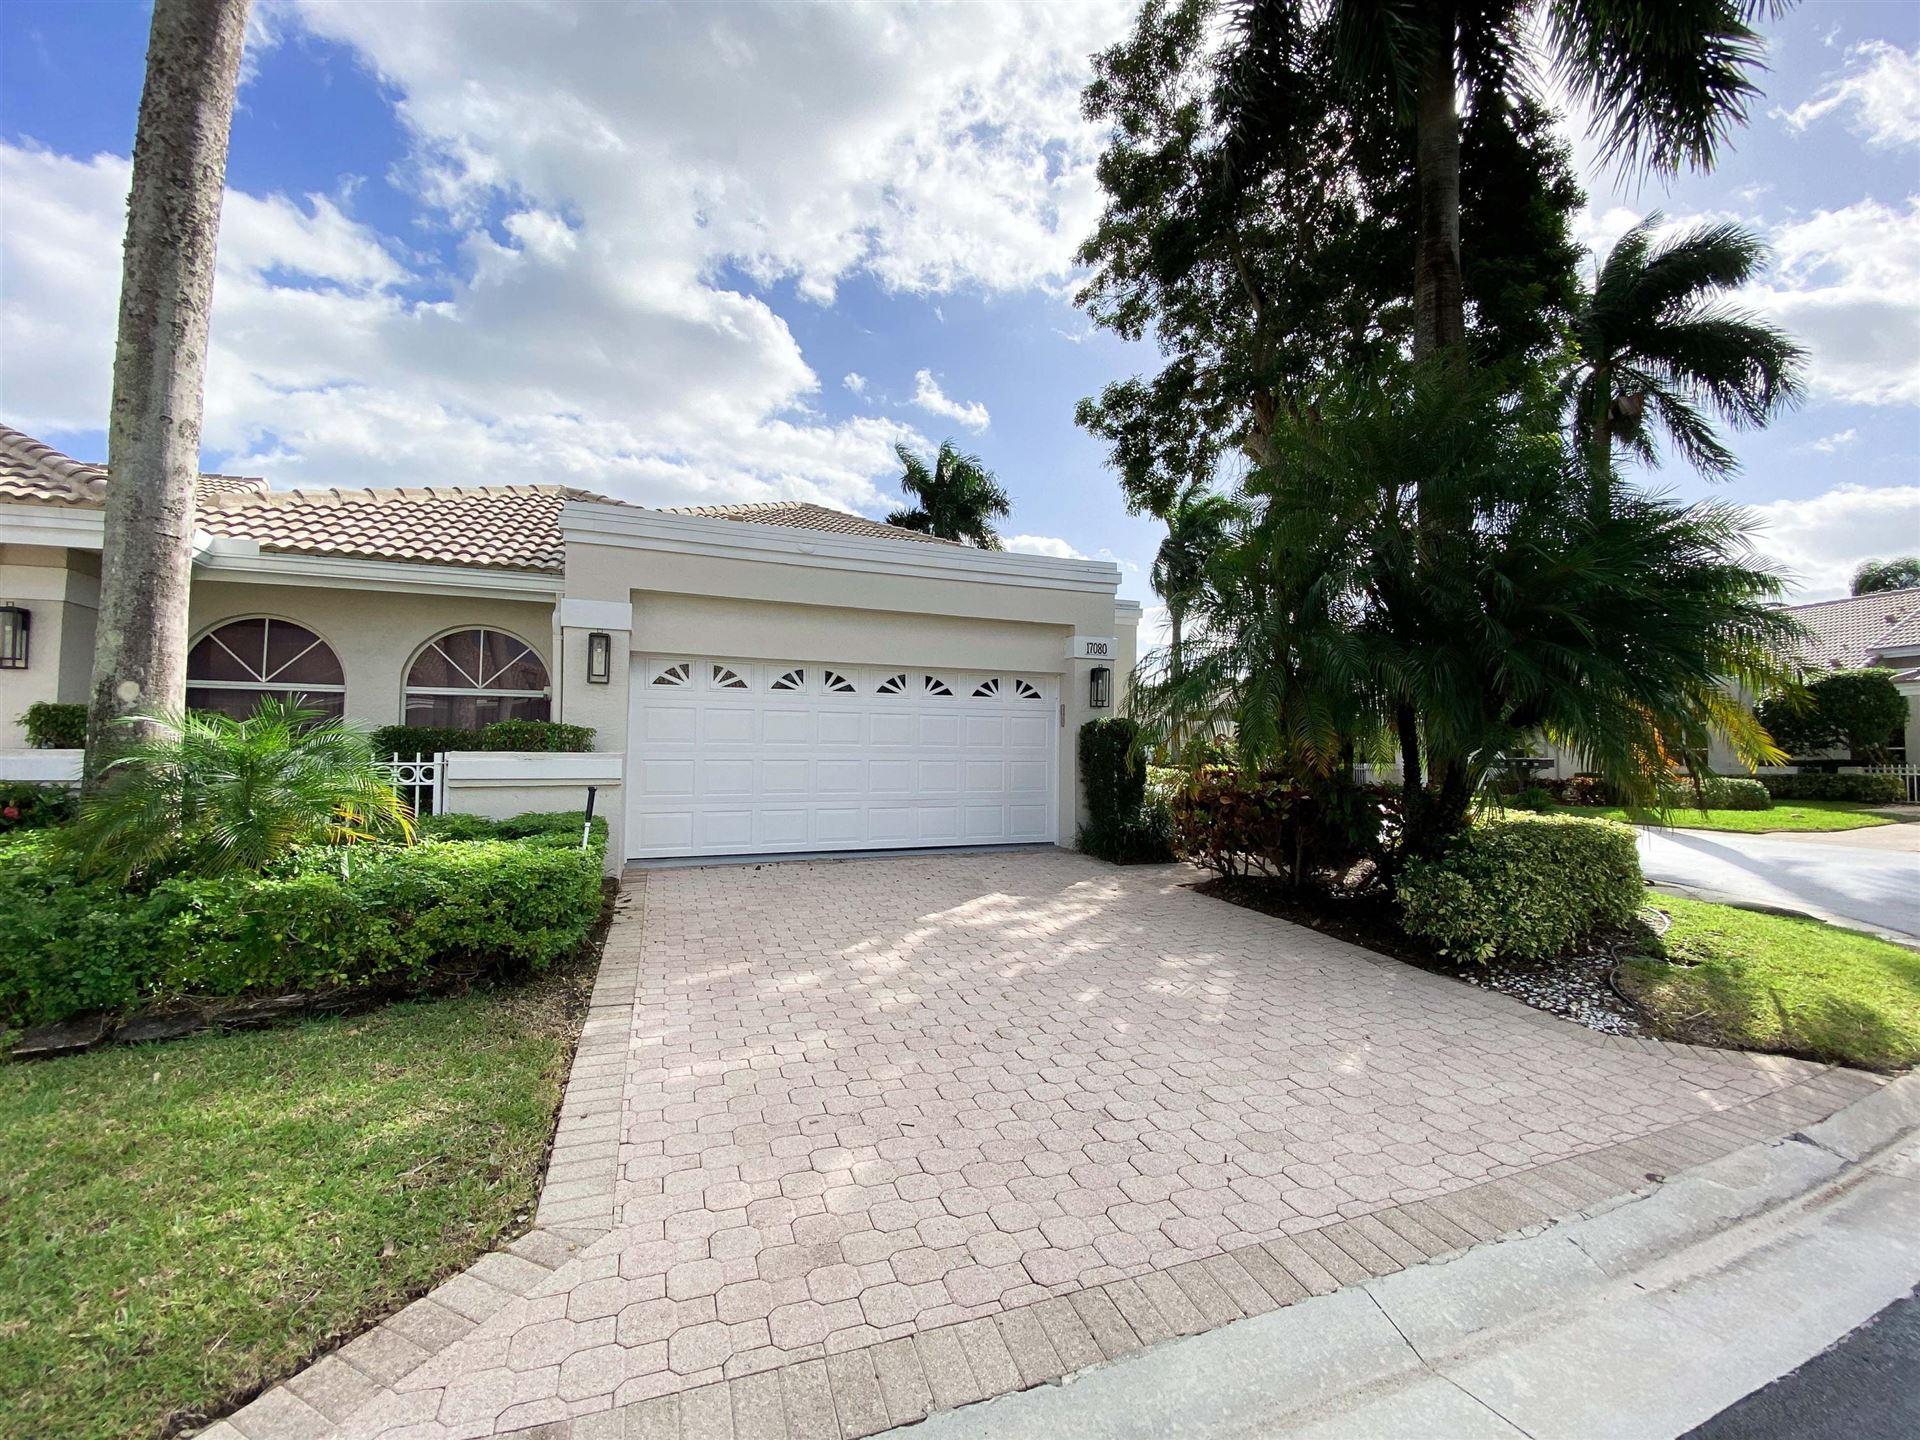 17080 Windsor Parke Court, Boca Raton, FL 33496 - MLS#: RX-10673770